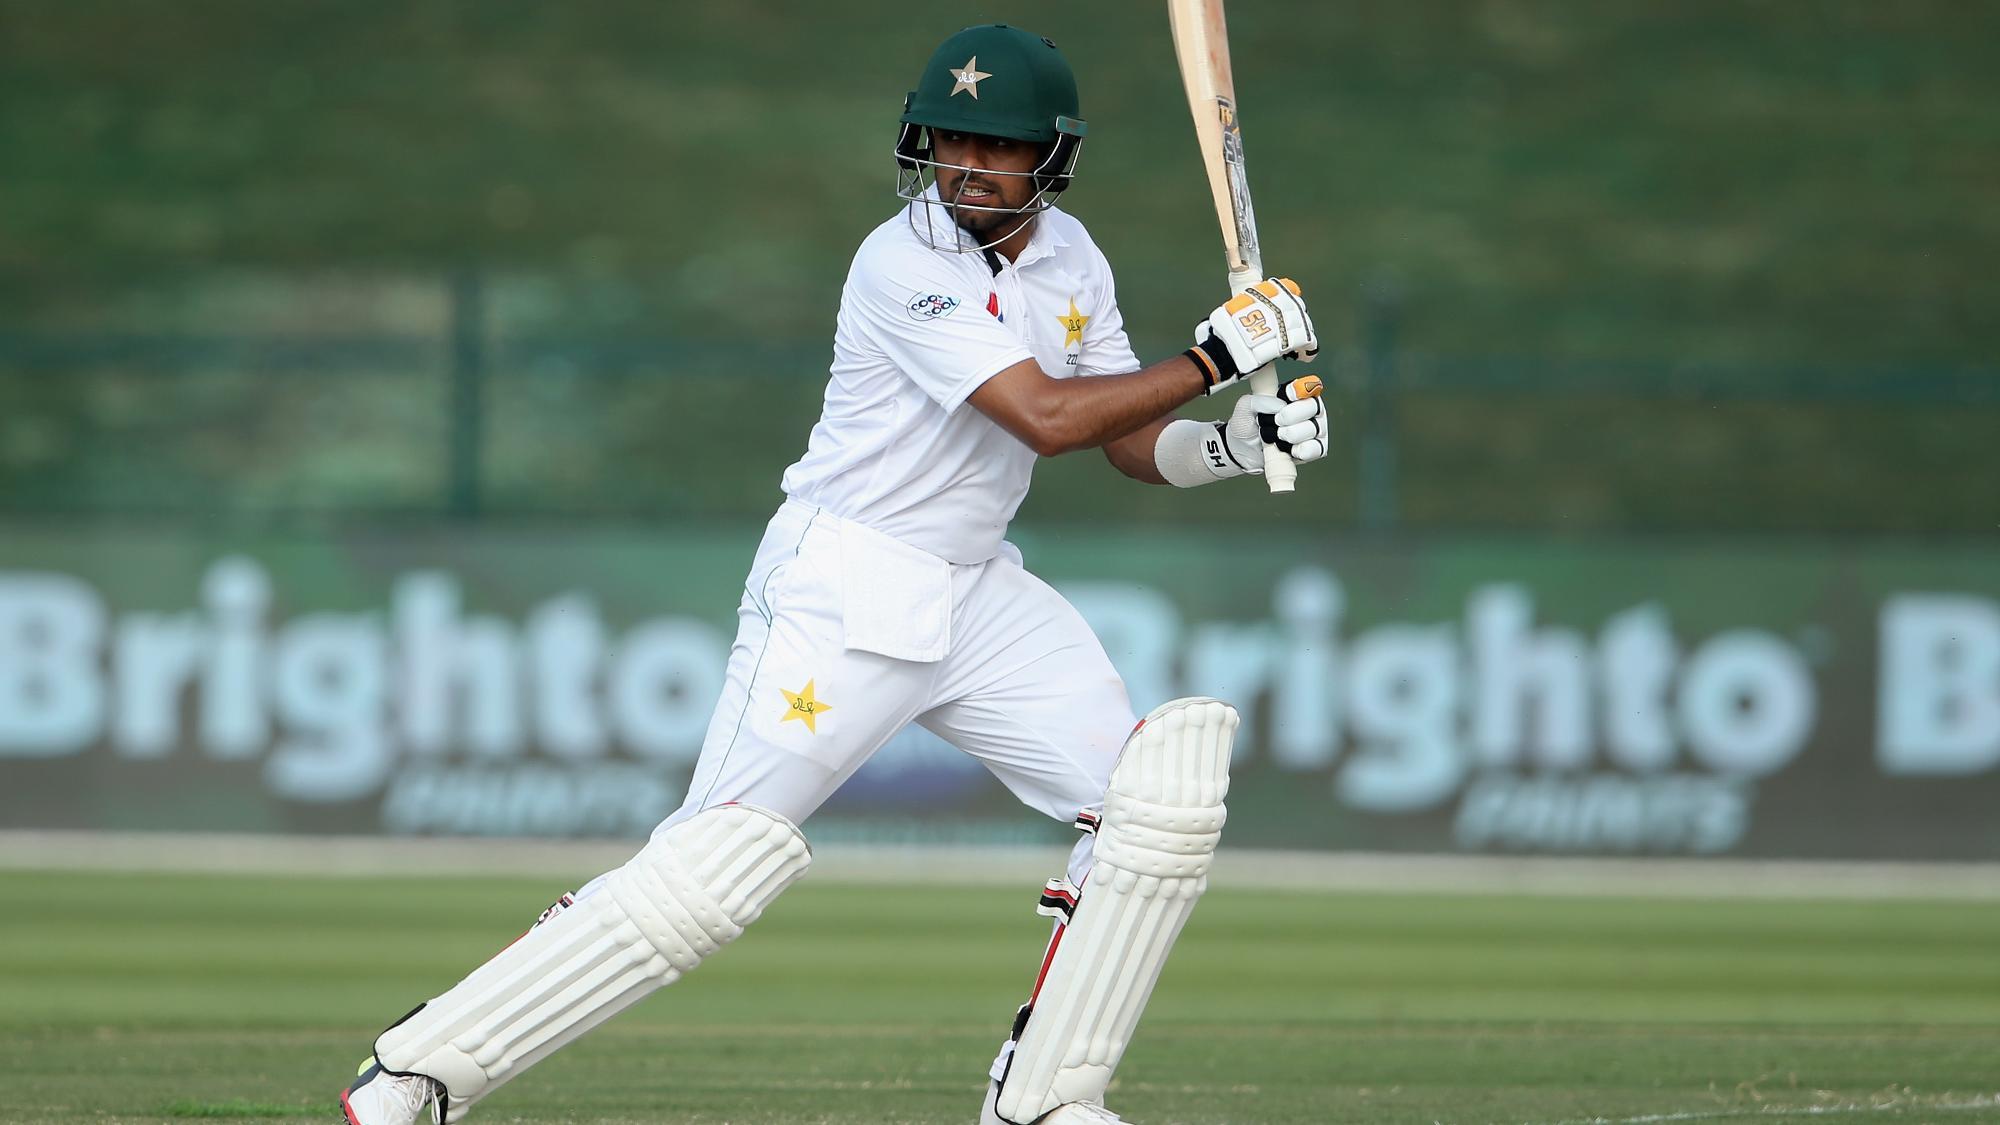 Pakistan nine strikes away from series-clinching win